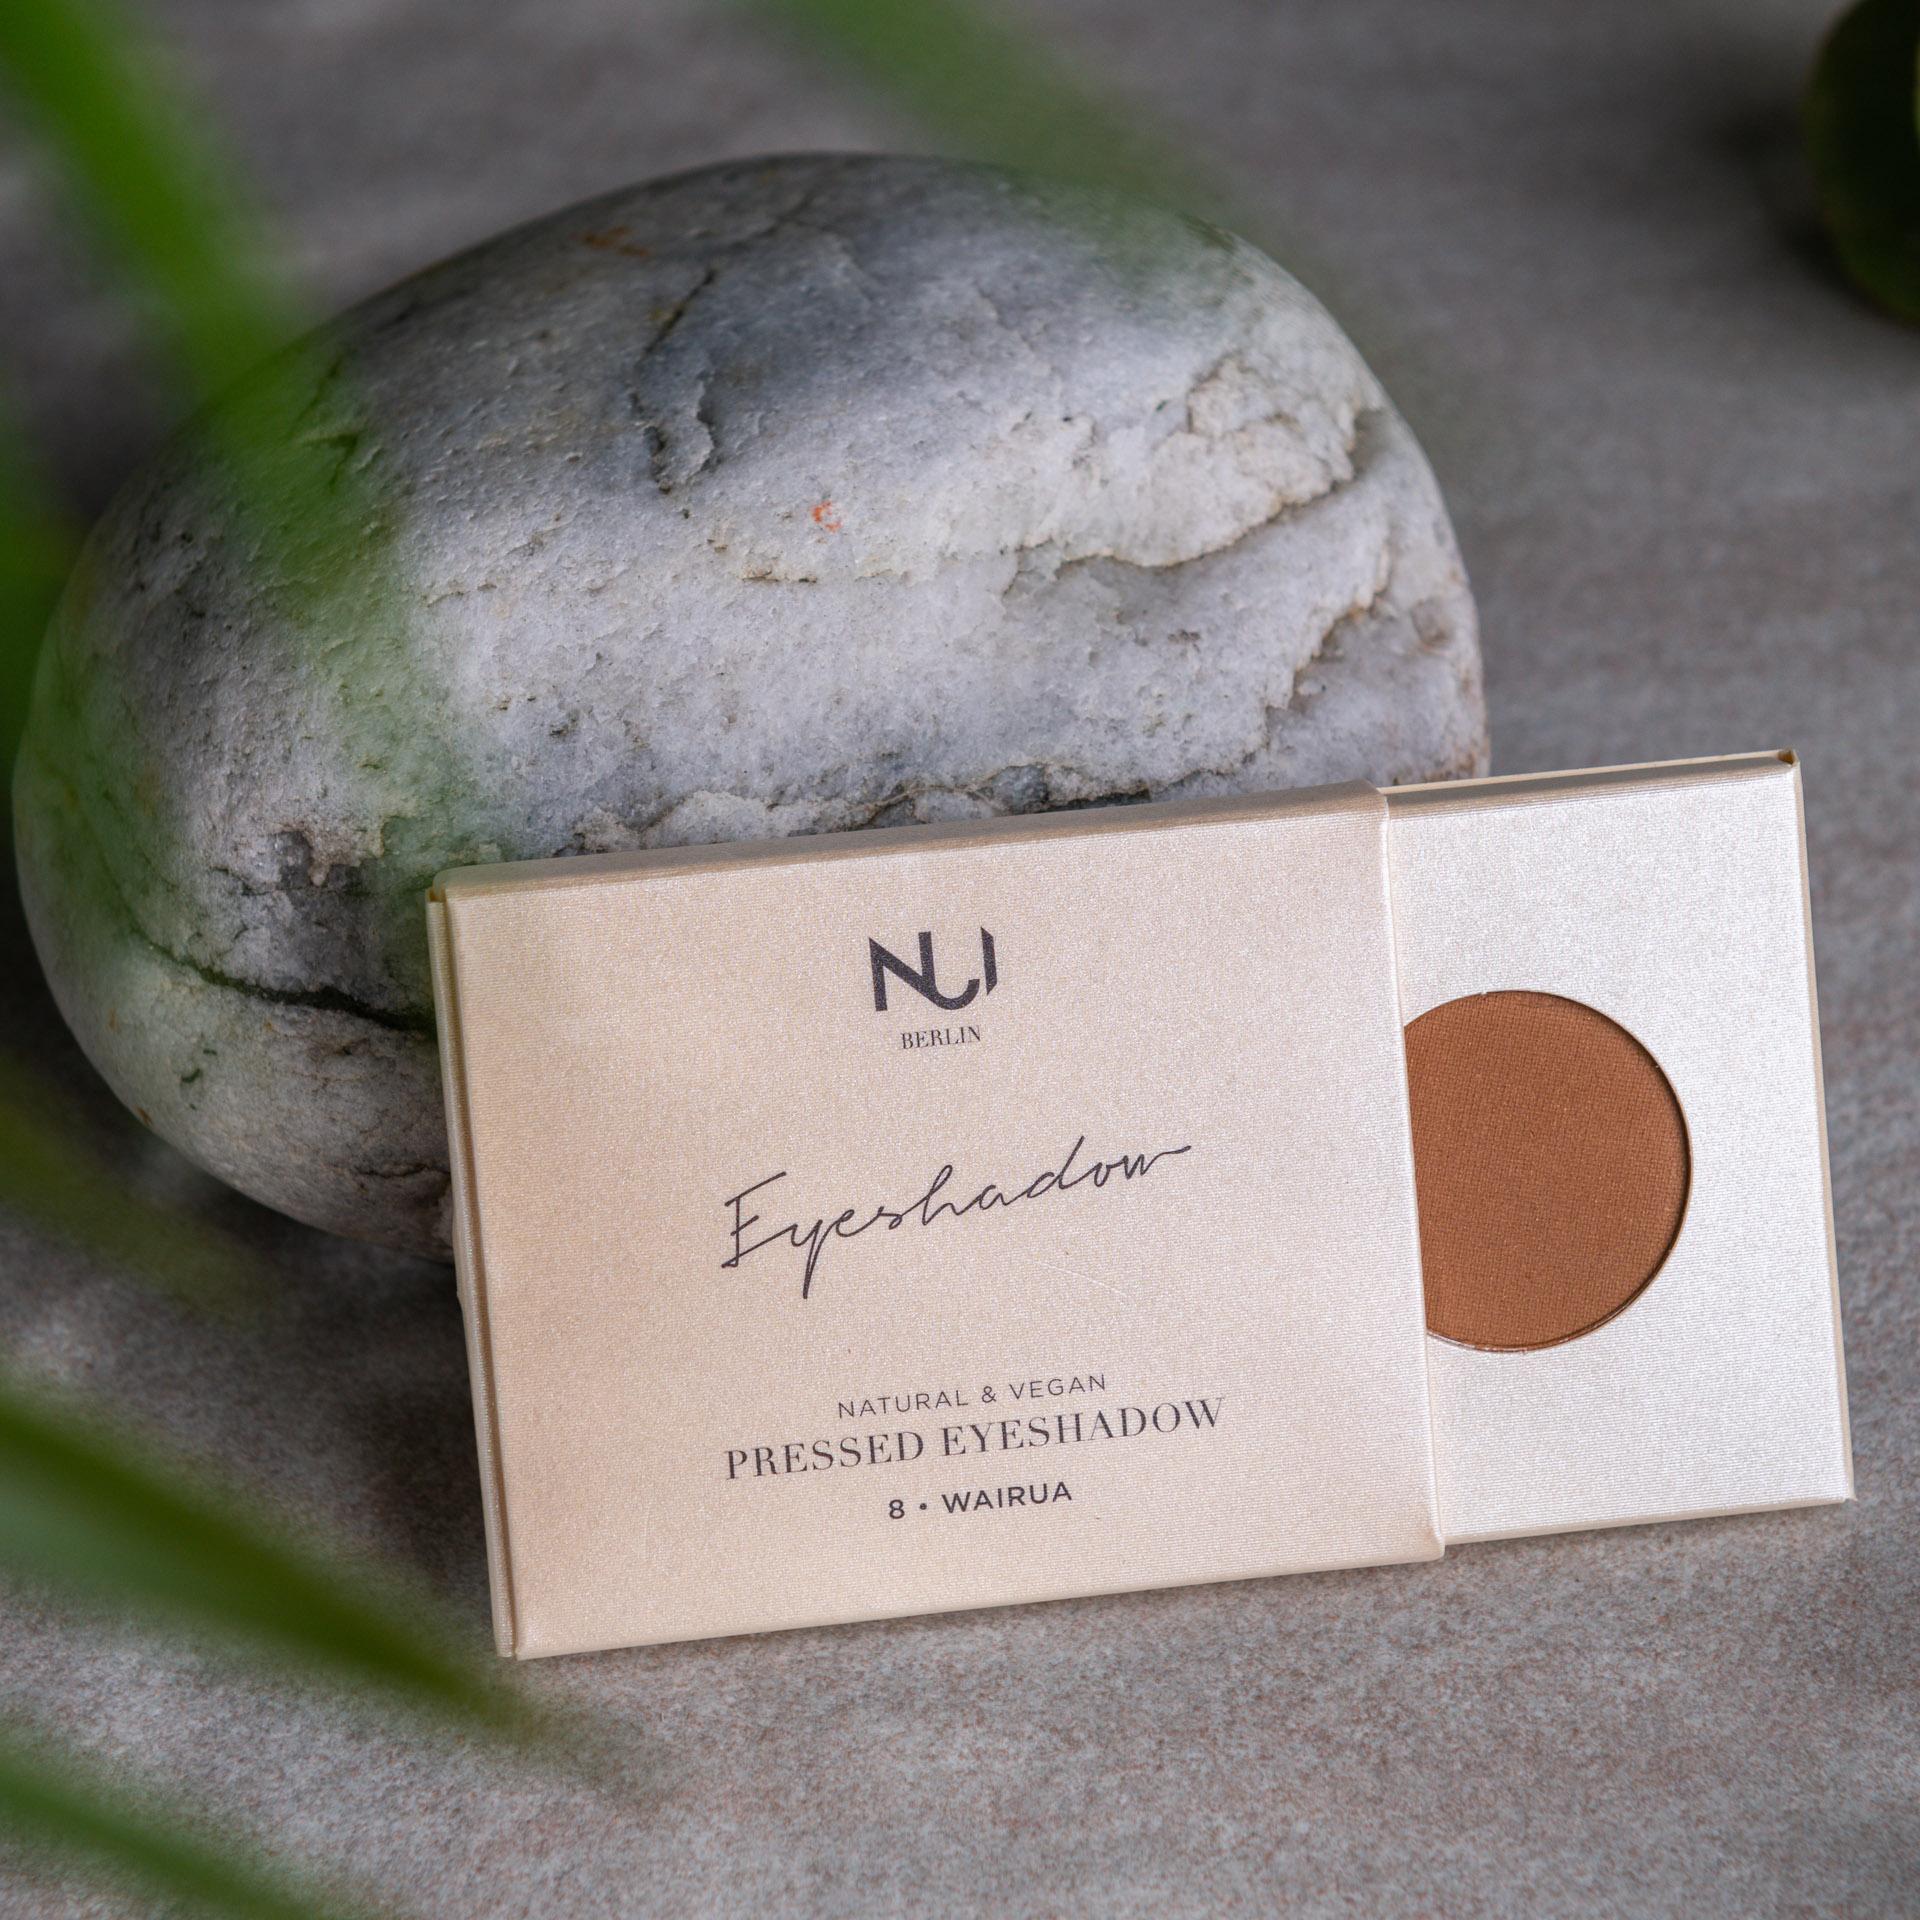 NUI Natural Pressed Eyeshadow 8 WAIRUA